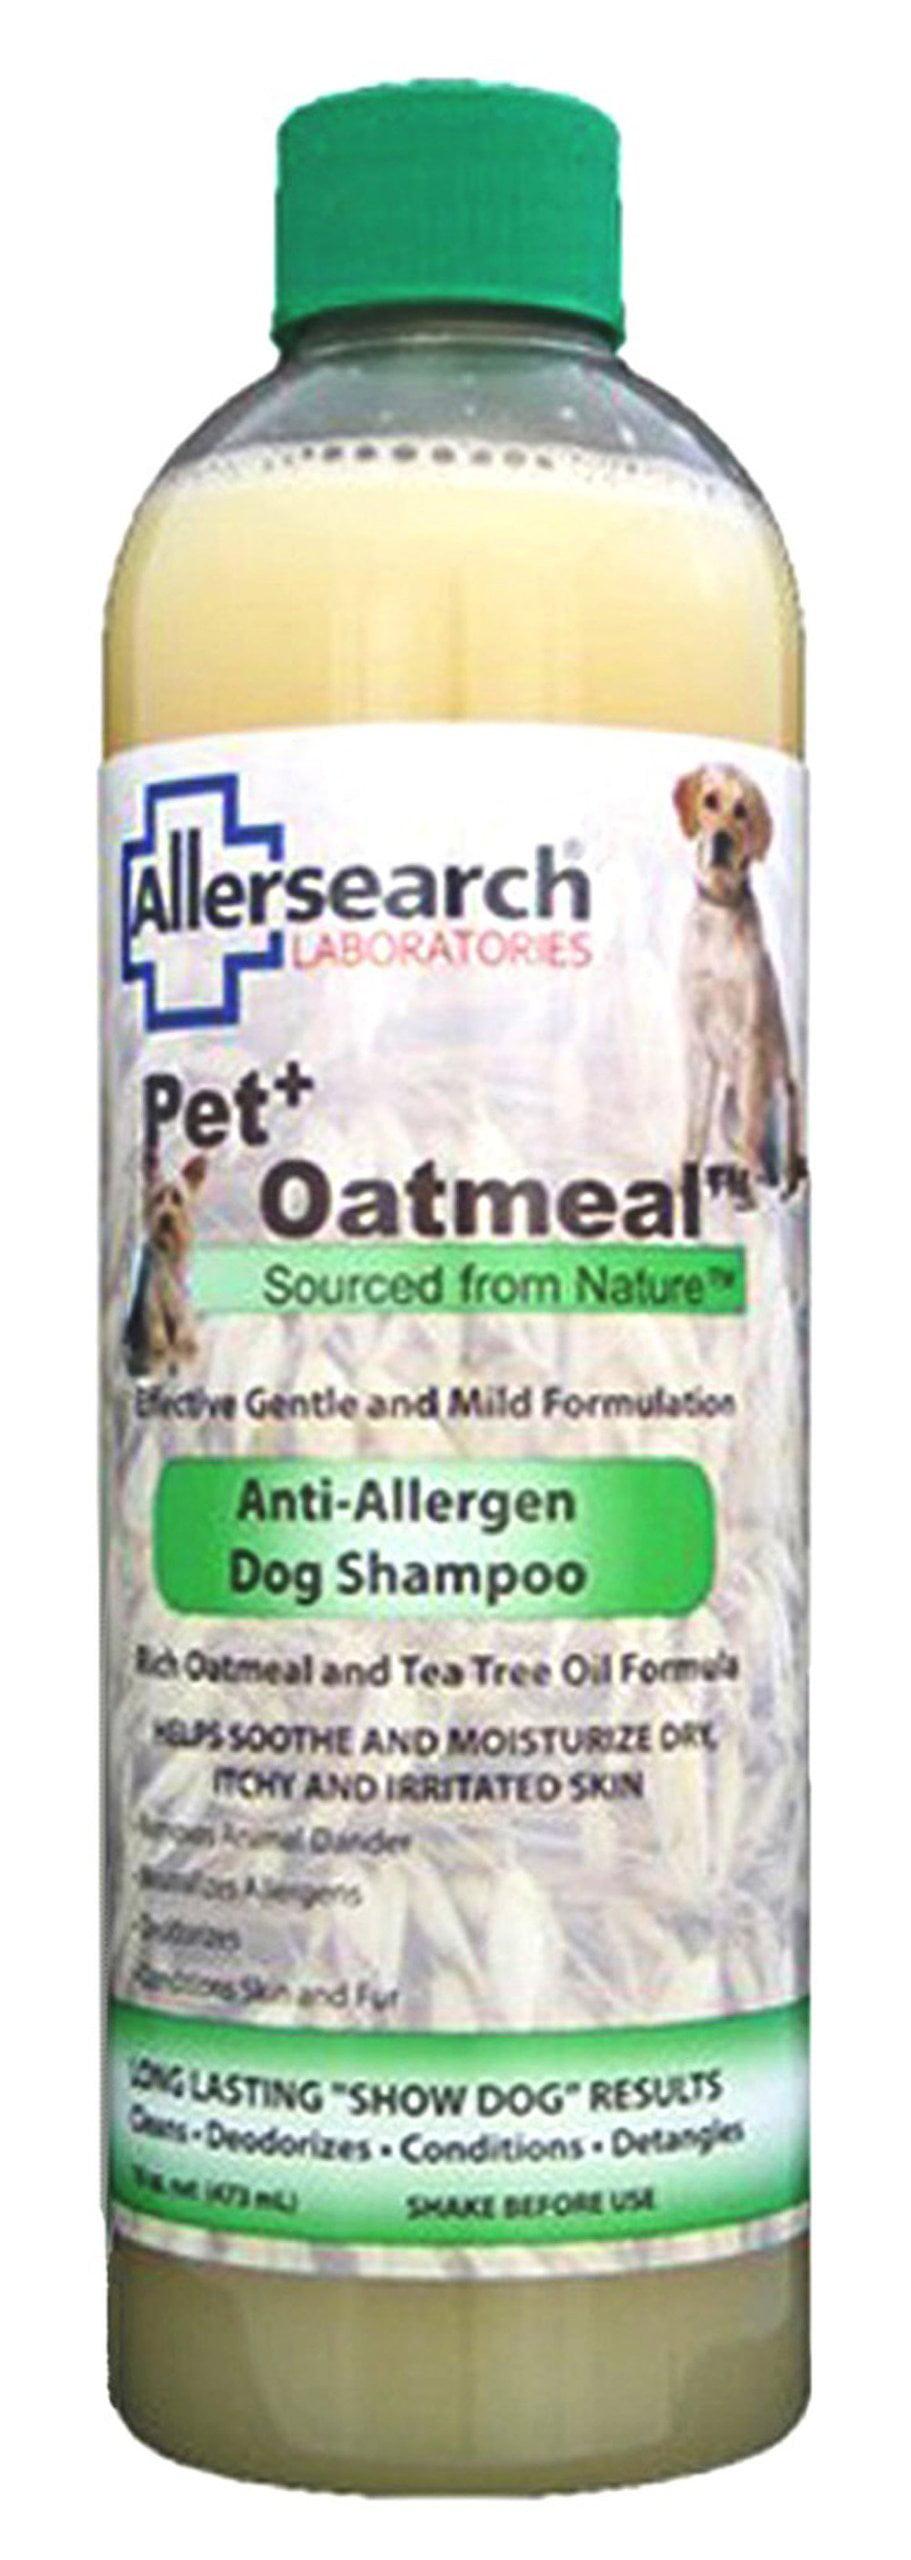 Allersearch Laboratories Pet Plus Oatmeal Anti-Allergen Dog Shampoo 16 oz. by